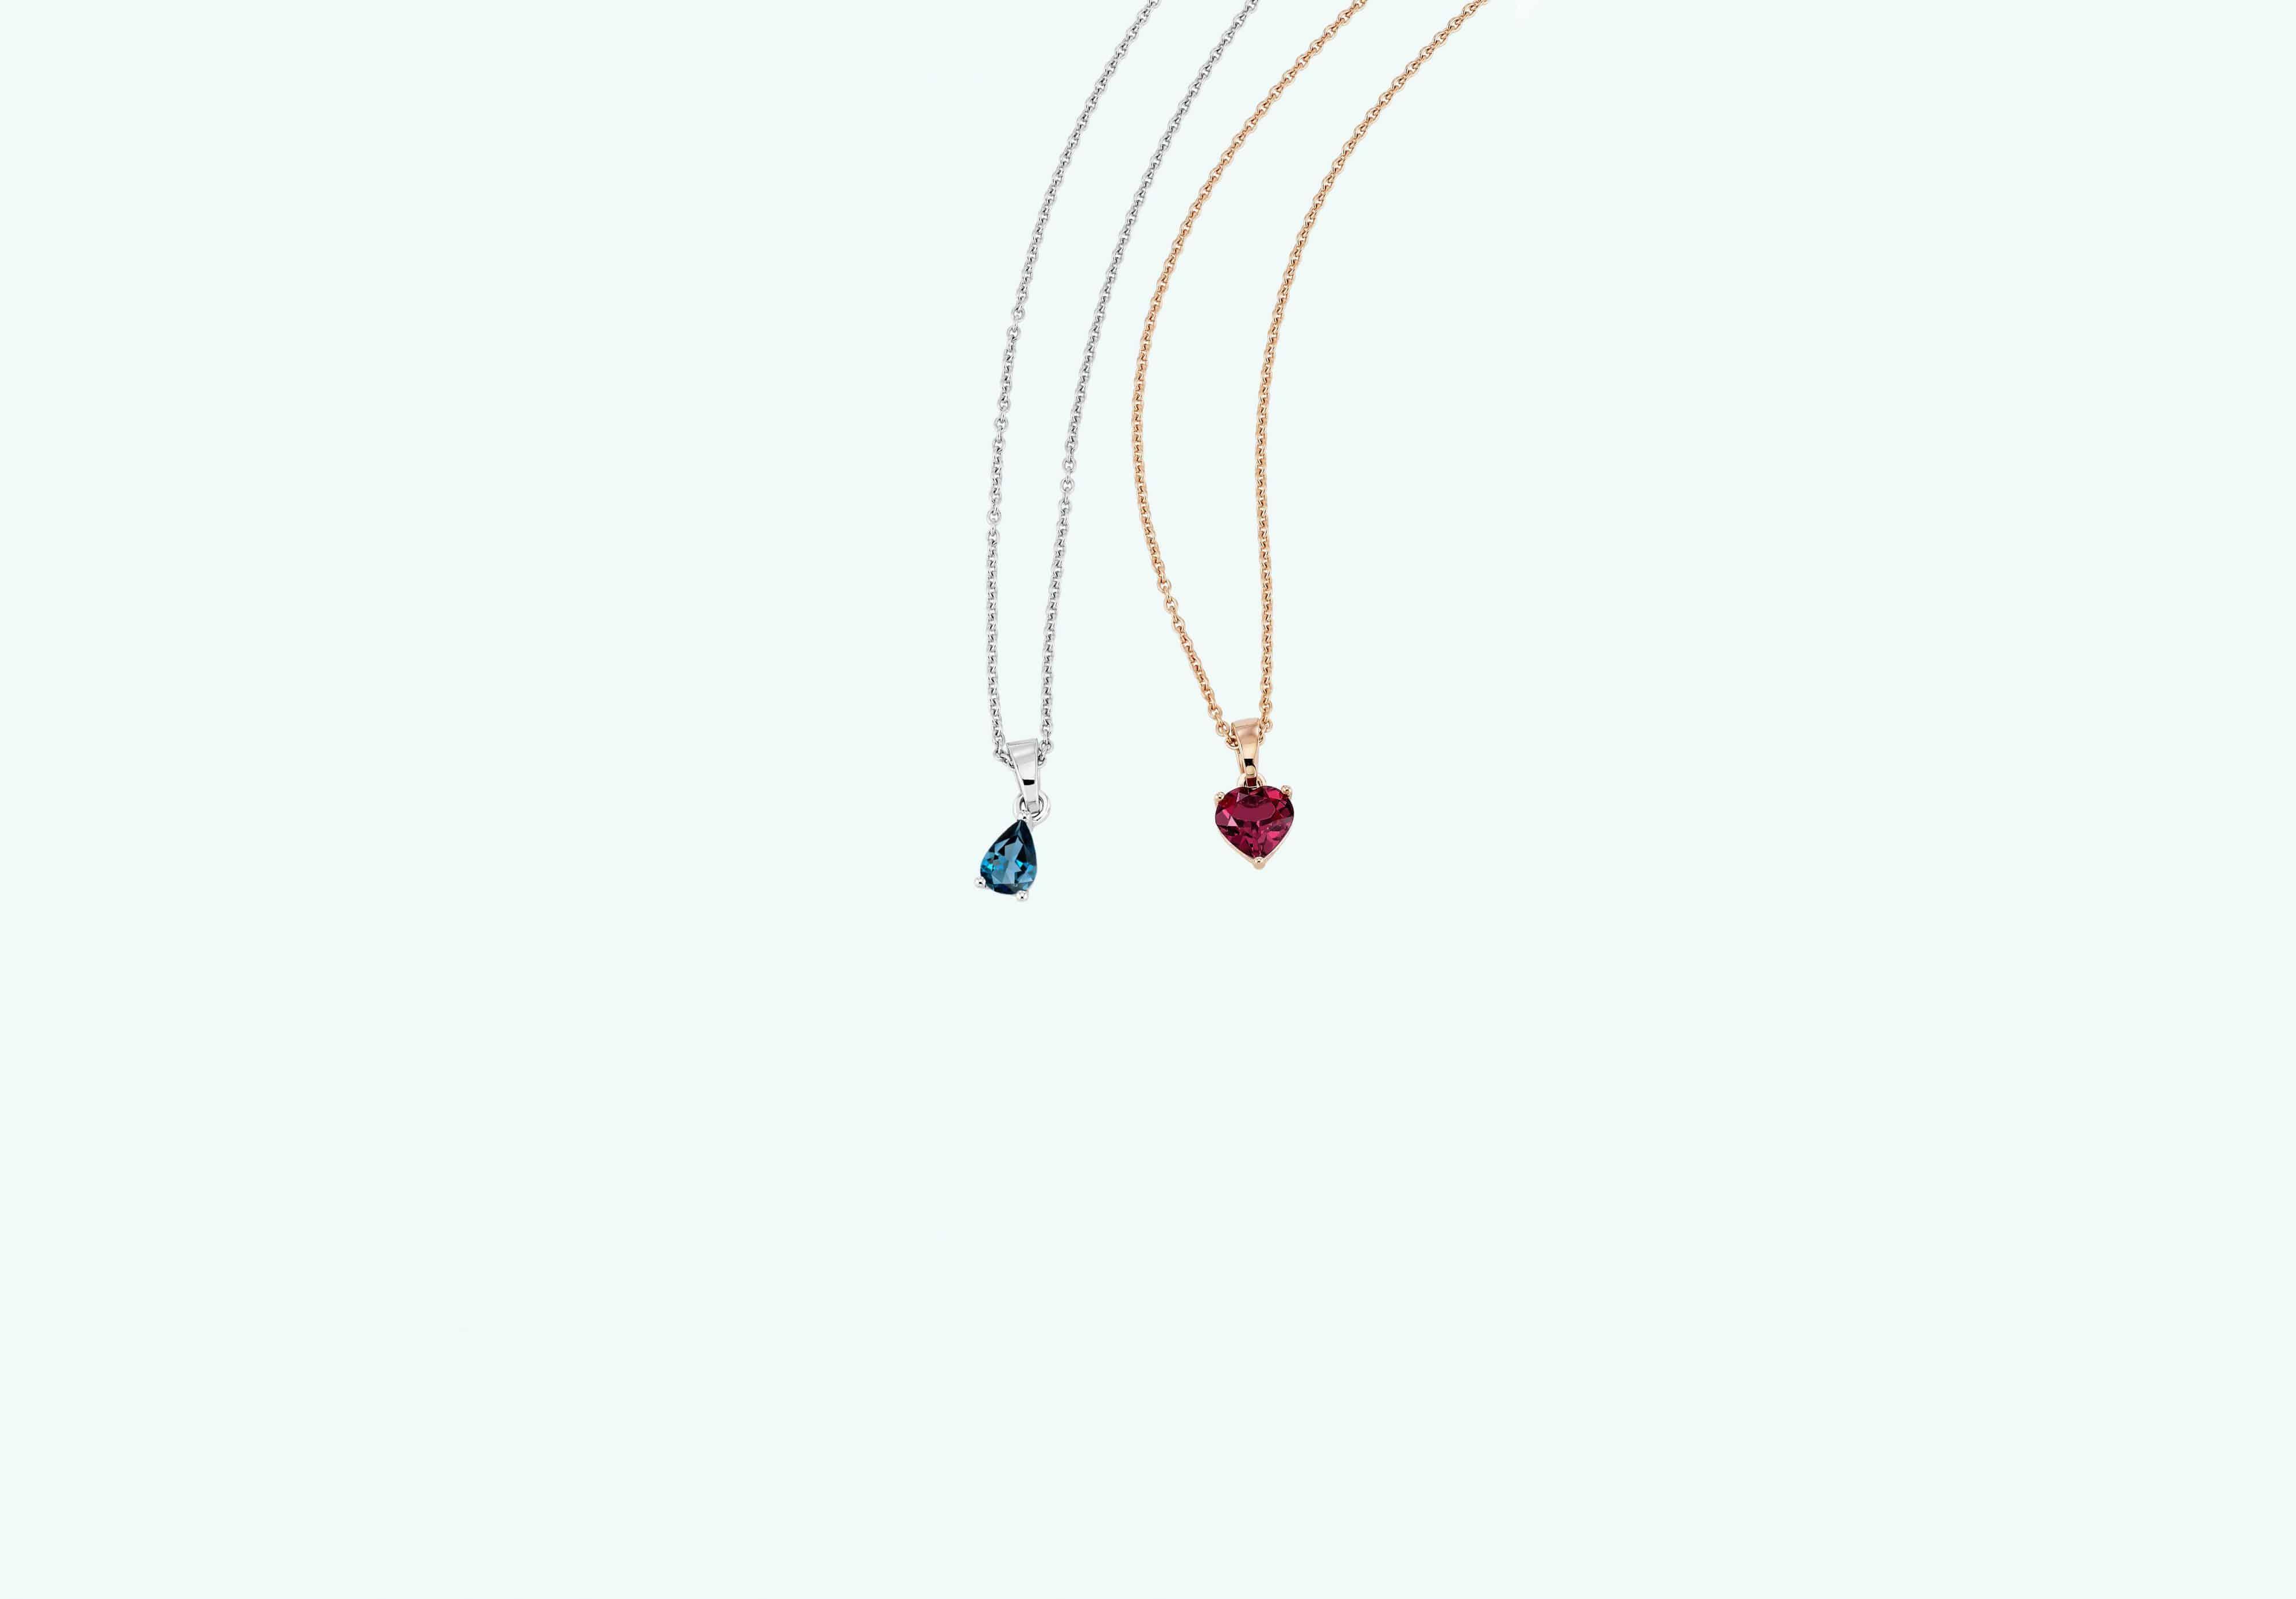 joaillerie, joaillier, gemmyo, bijoux, pendentif